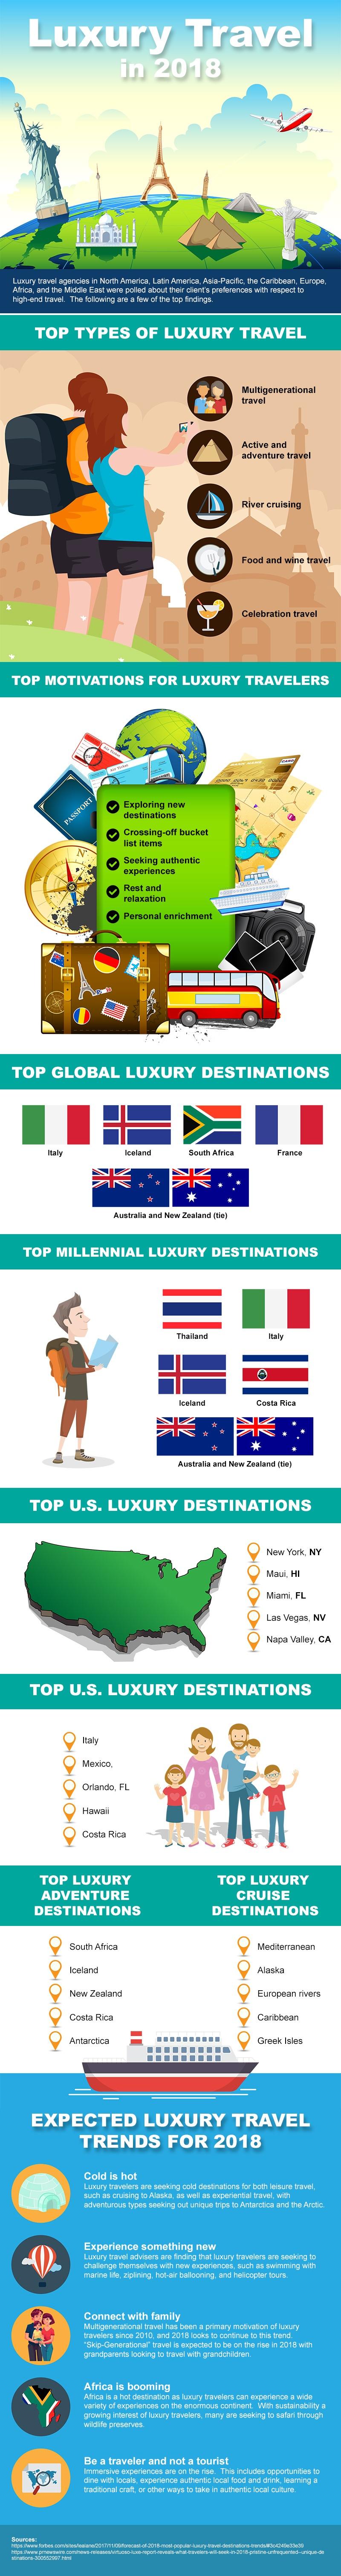 Luxury Travel Trends Infographic v2.jpeg